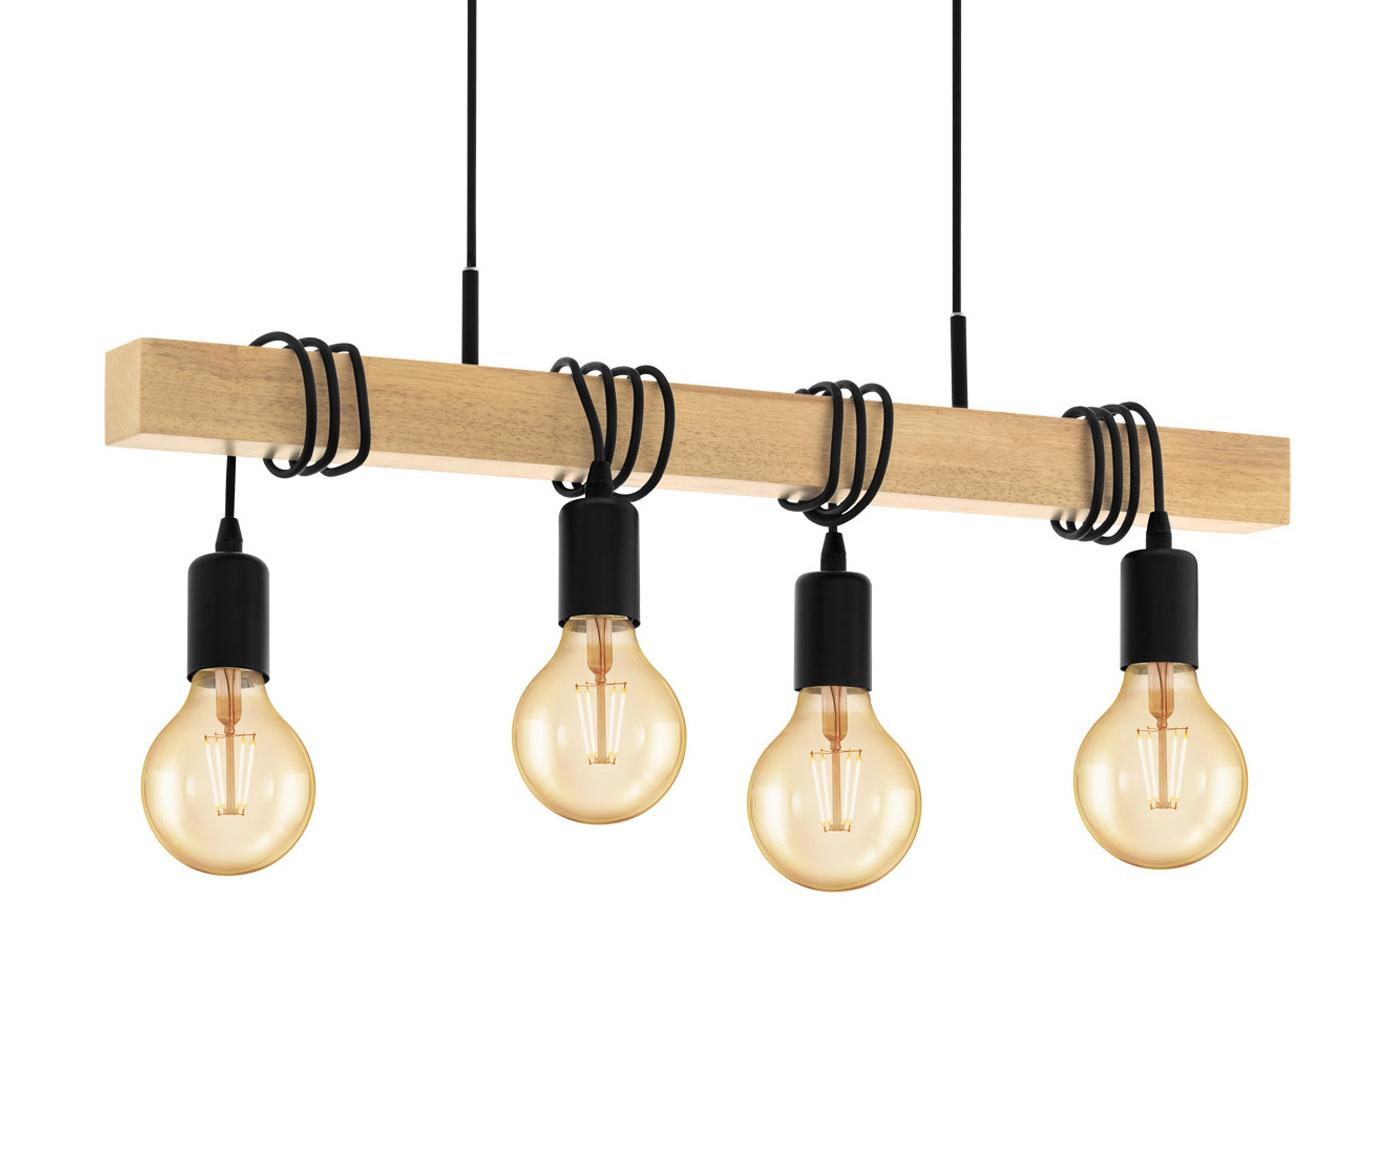 Lámpara de techo Townshend, estilo retro, Cable: plástico, Negro, madera, An 70 x Al 25 cm